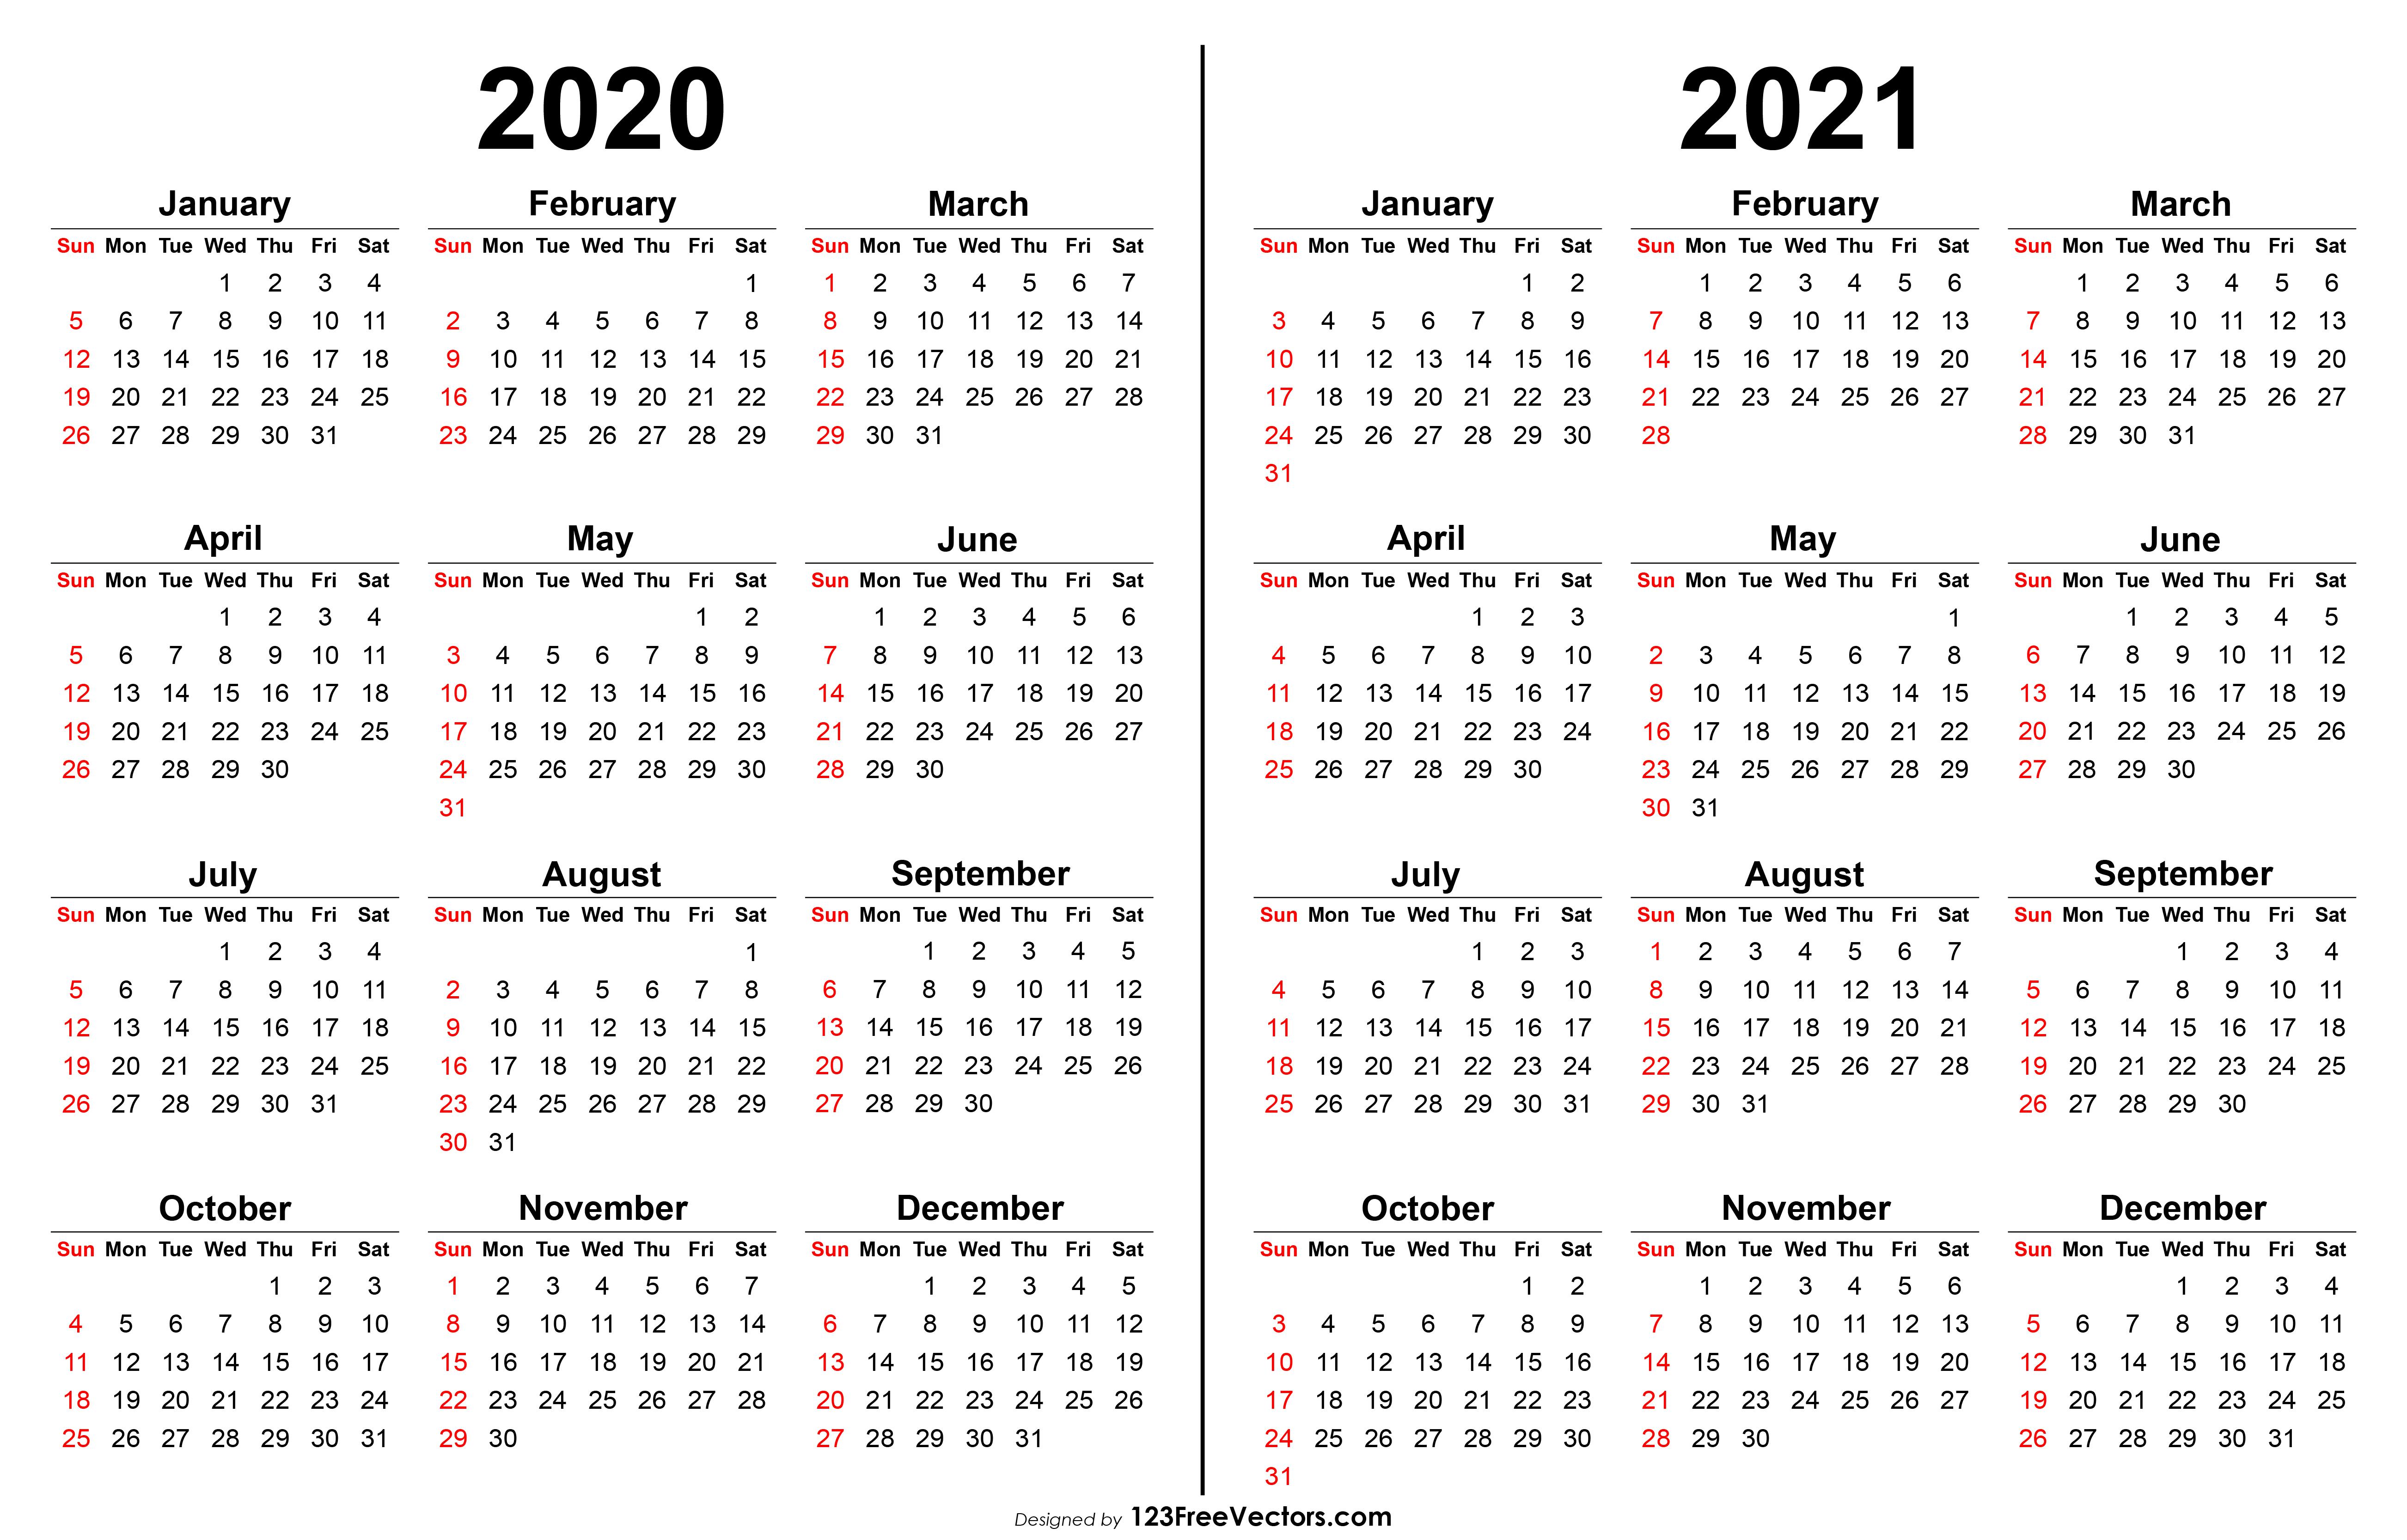 2020 2021 Calendar with regard to 2 Year Calendar Template 2020 2021